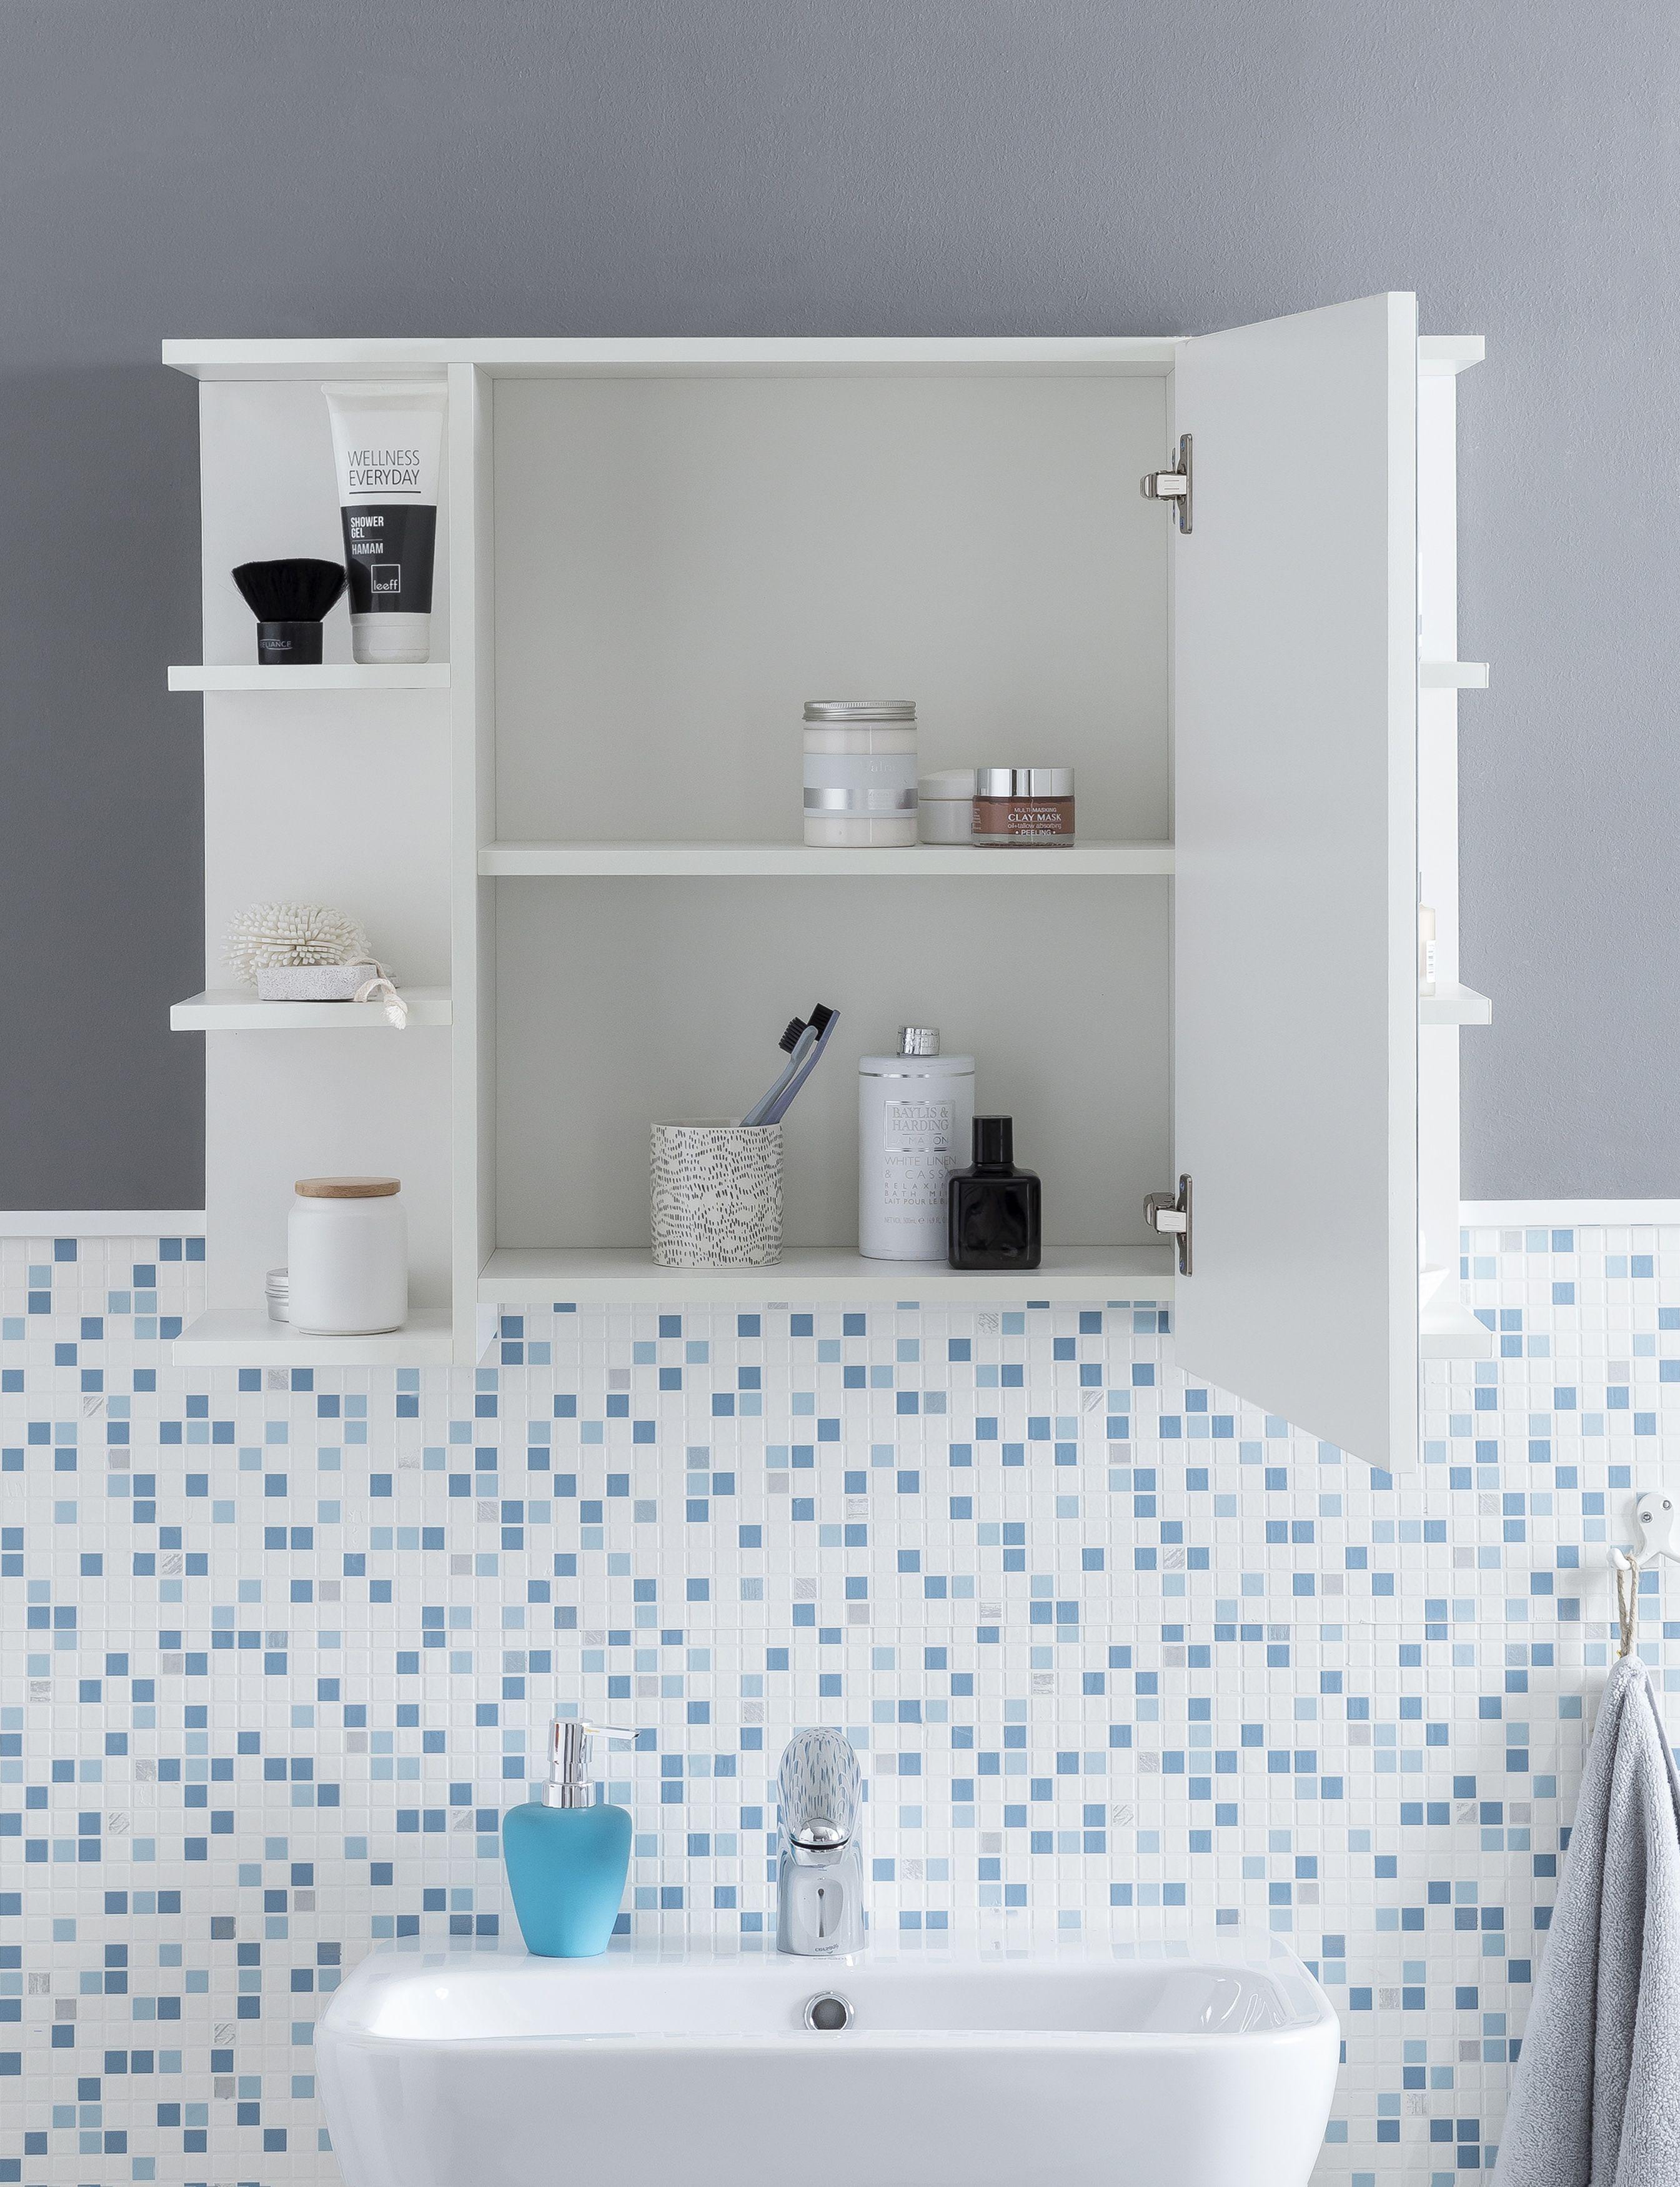 Badezimmer Spiegel Schrankchen Badmobel Regal Hangeregal Badregal